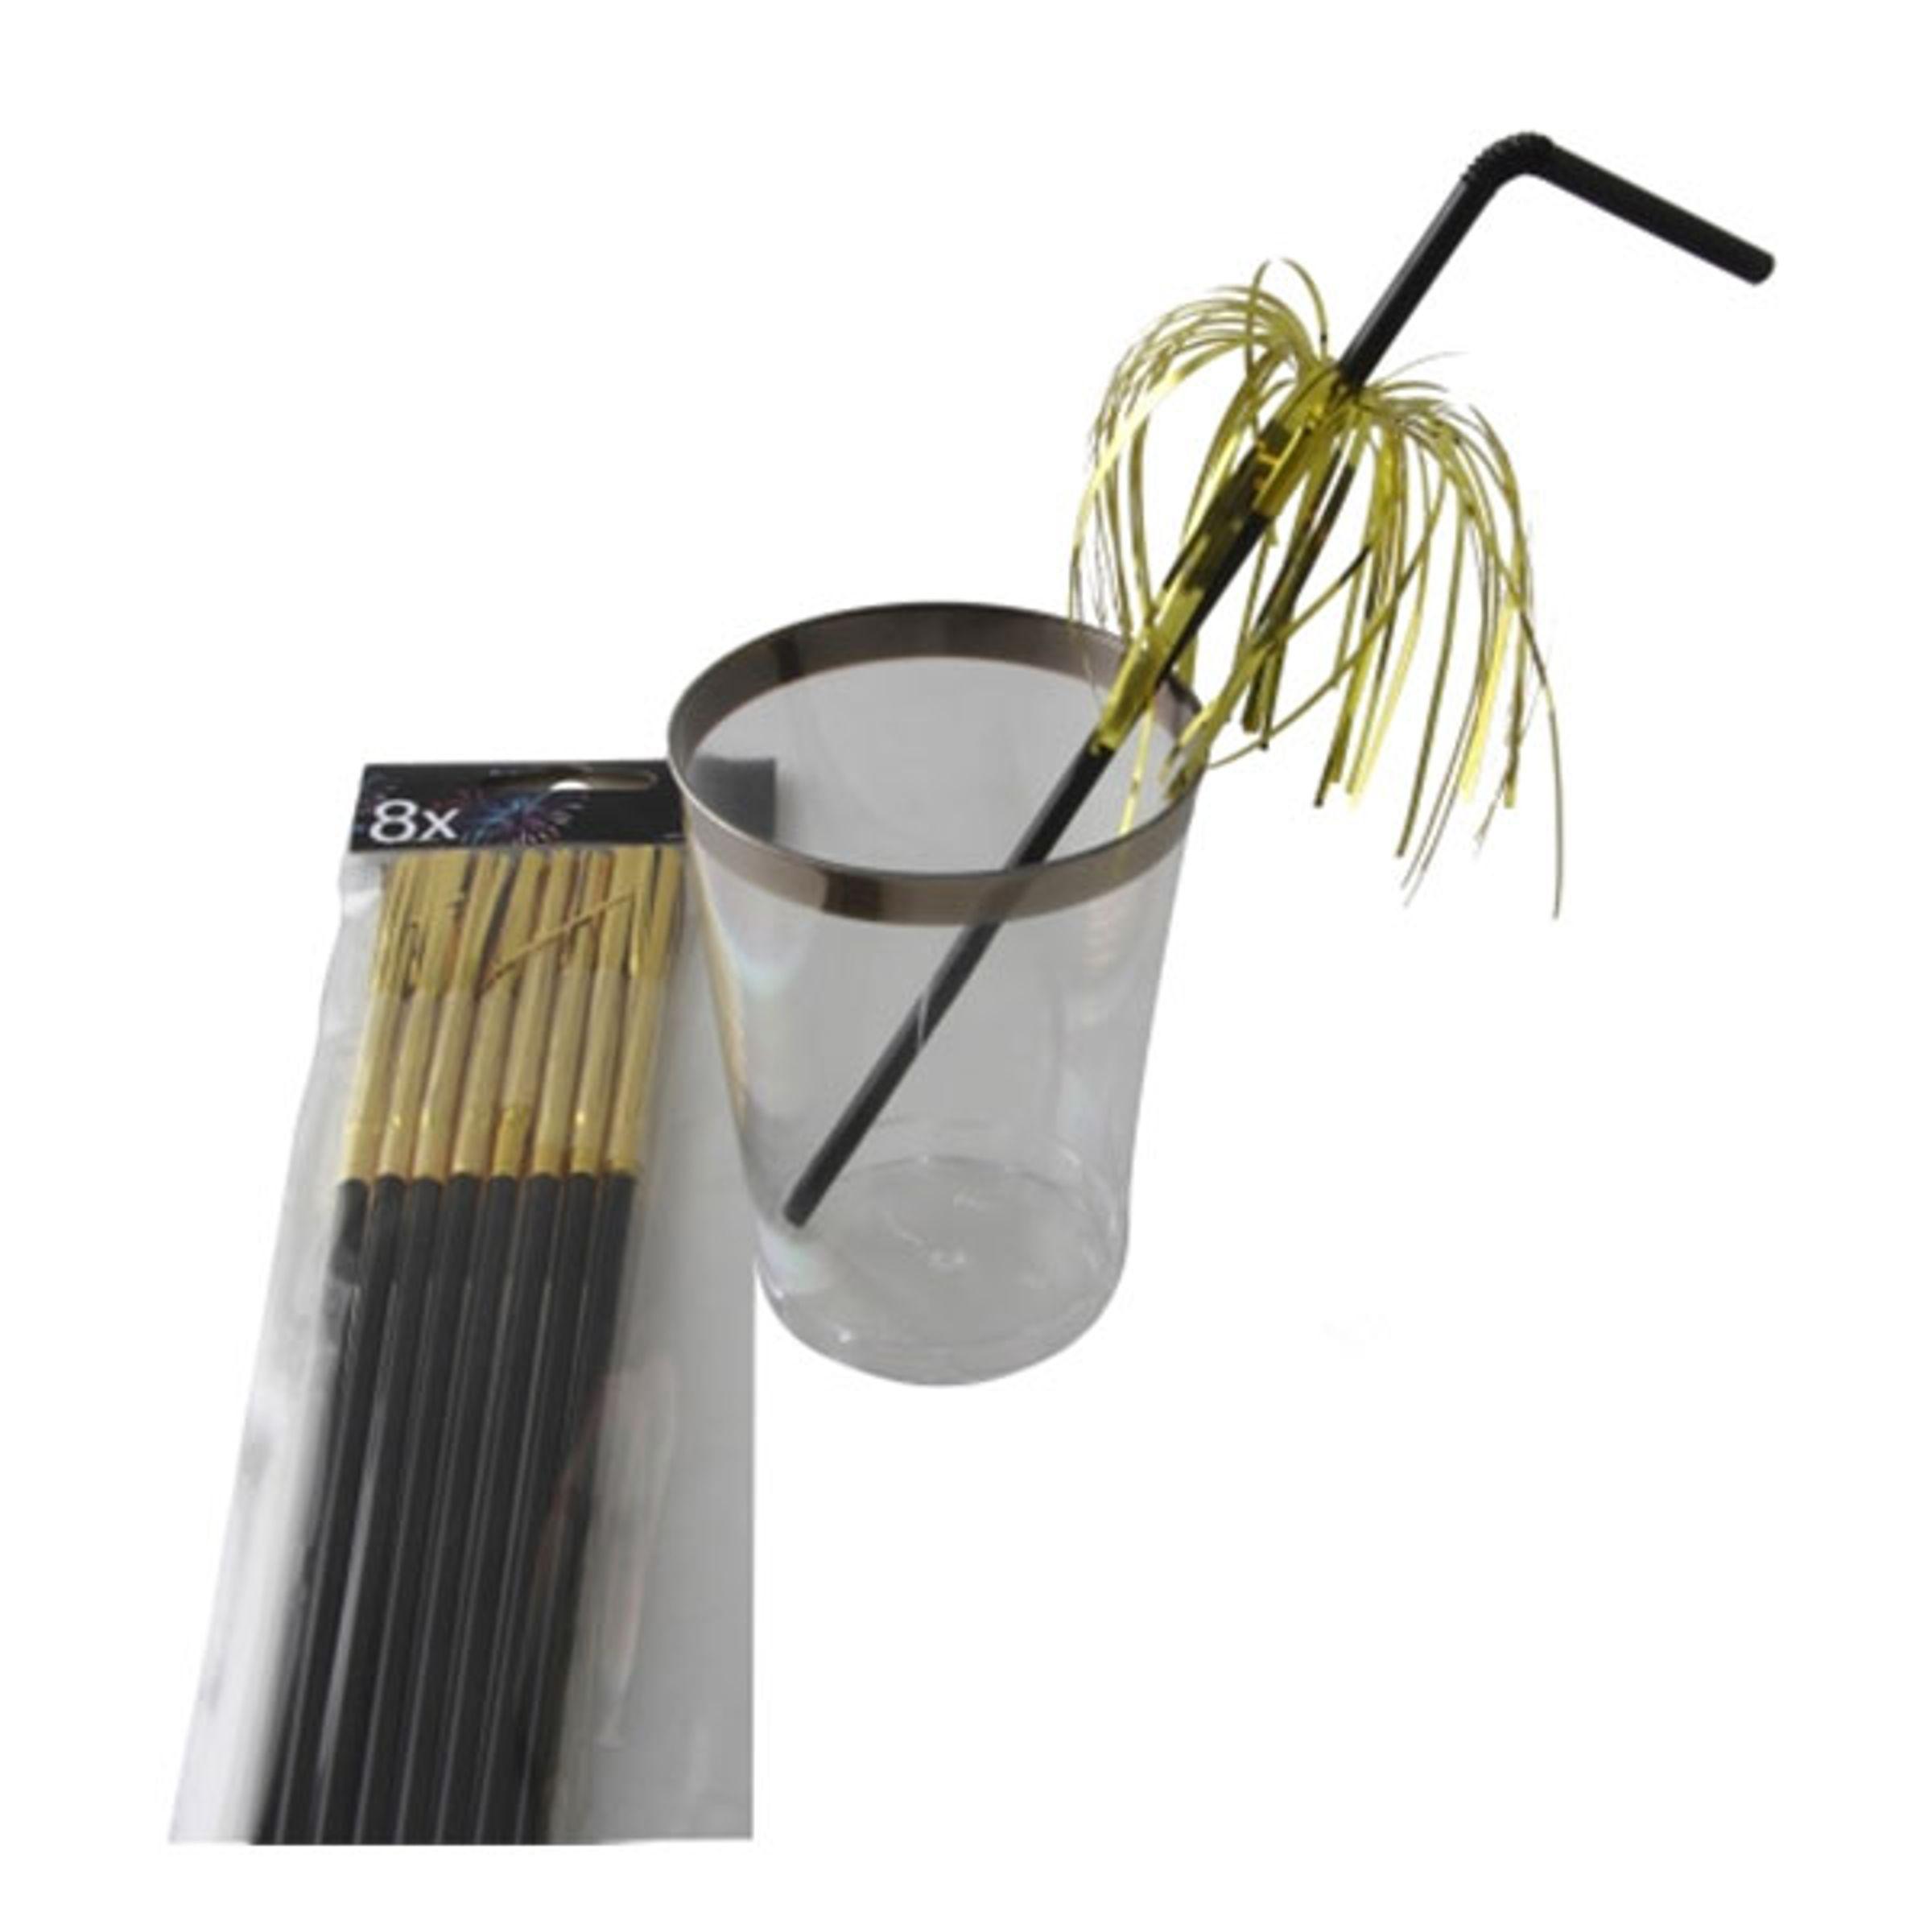 Sugrör Fyrverkerier - Guld